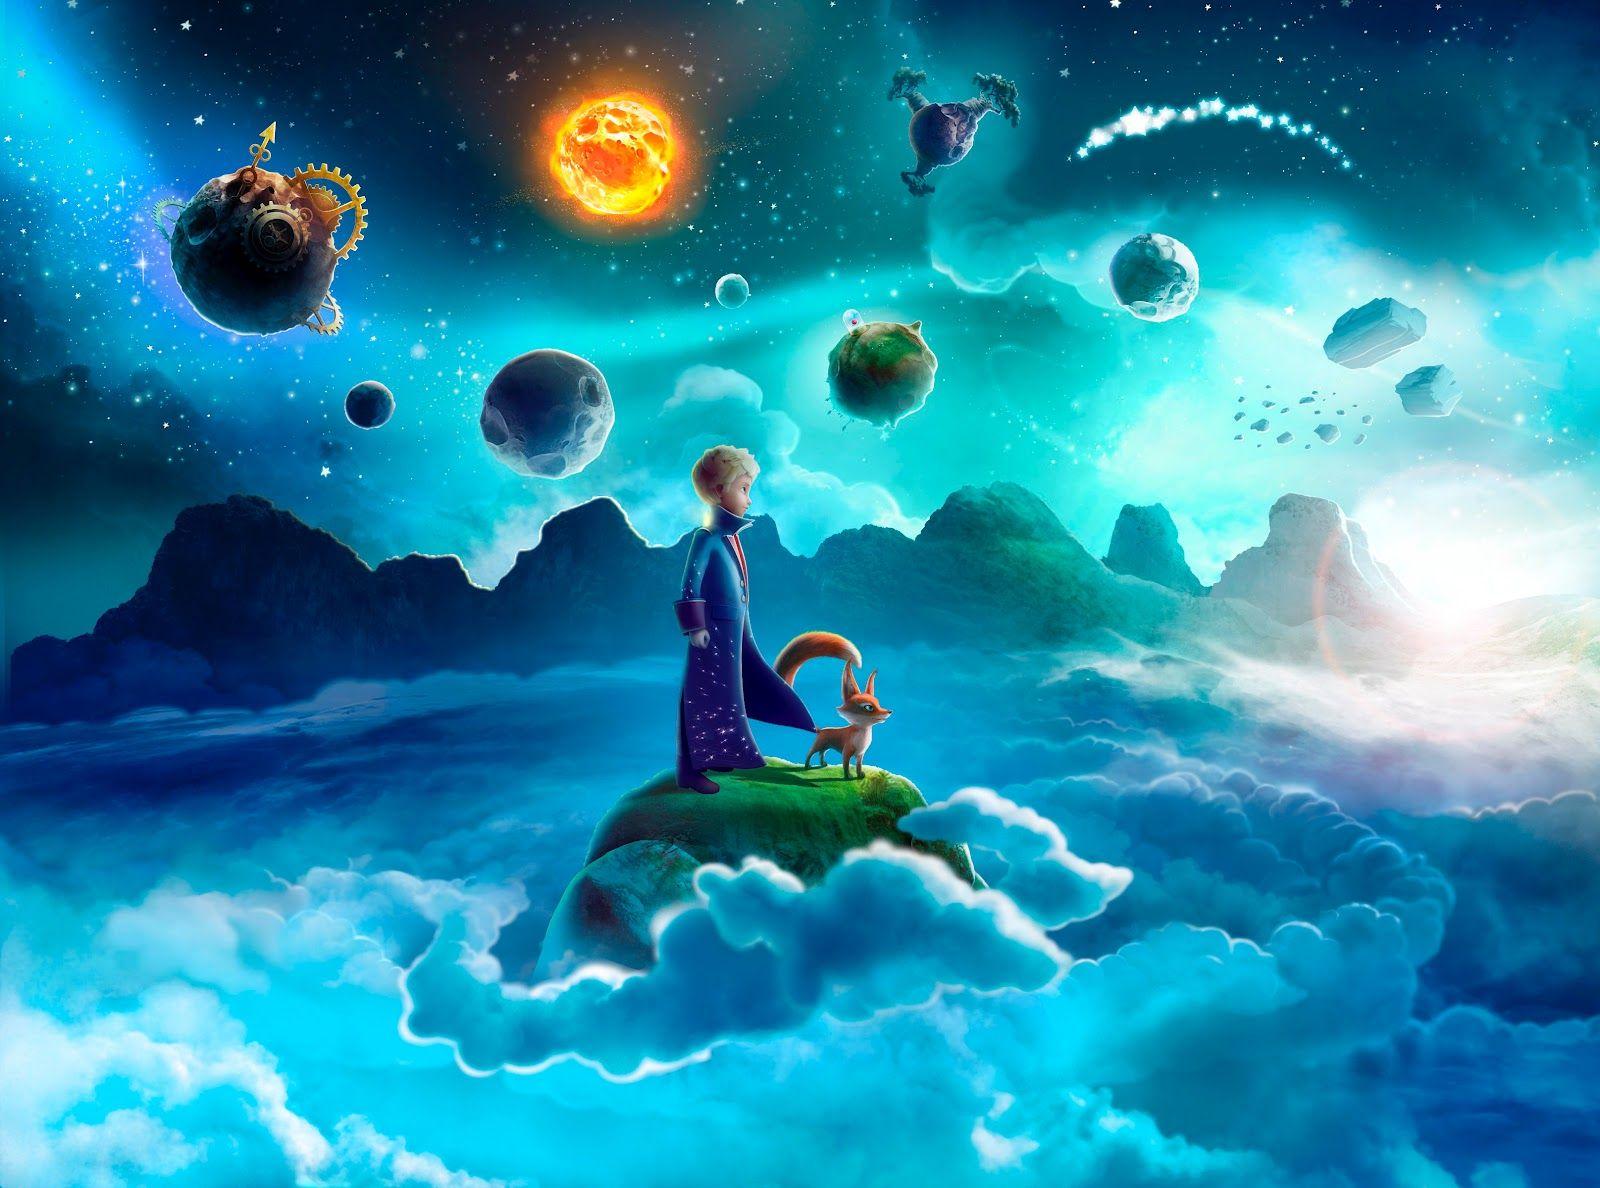 Le Petit Prince Imagenes del principito, El principito